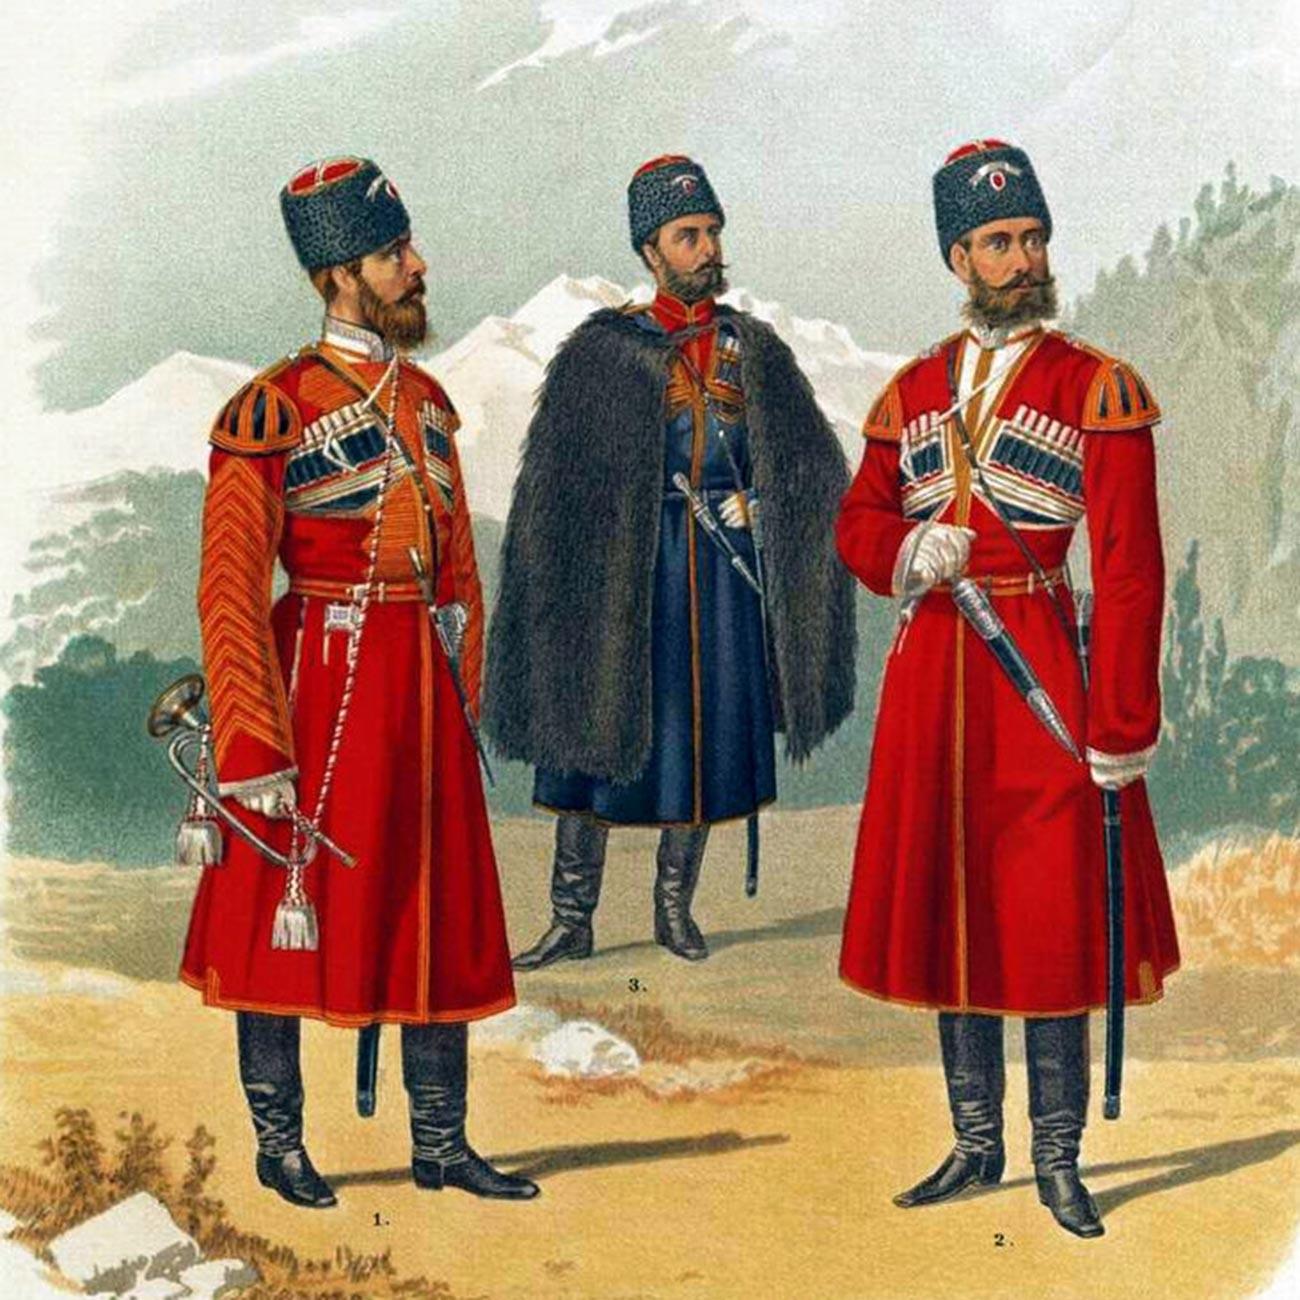 His Majesty's Own Cossack Escort. Uniforms.